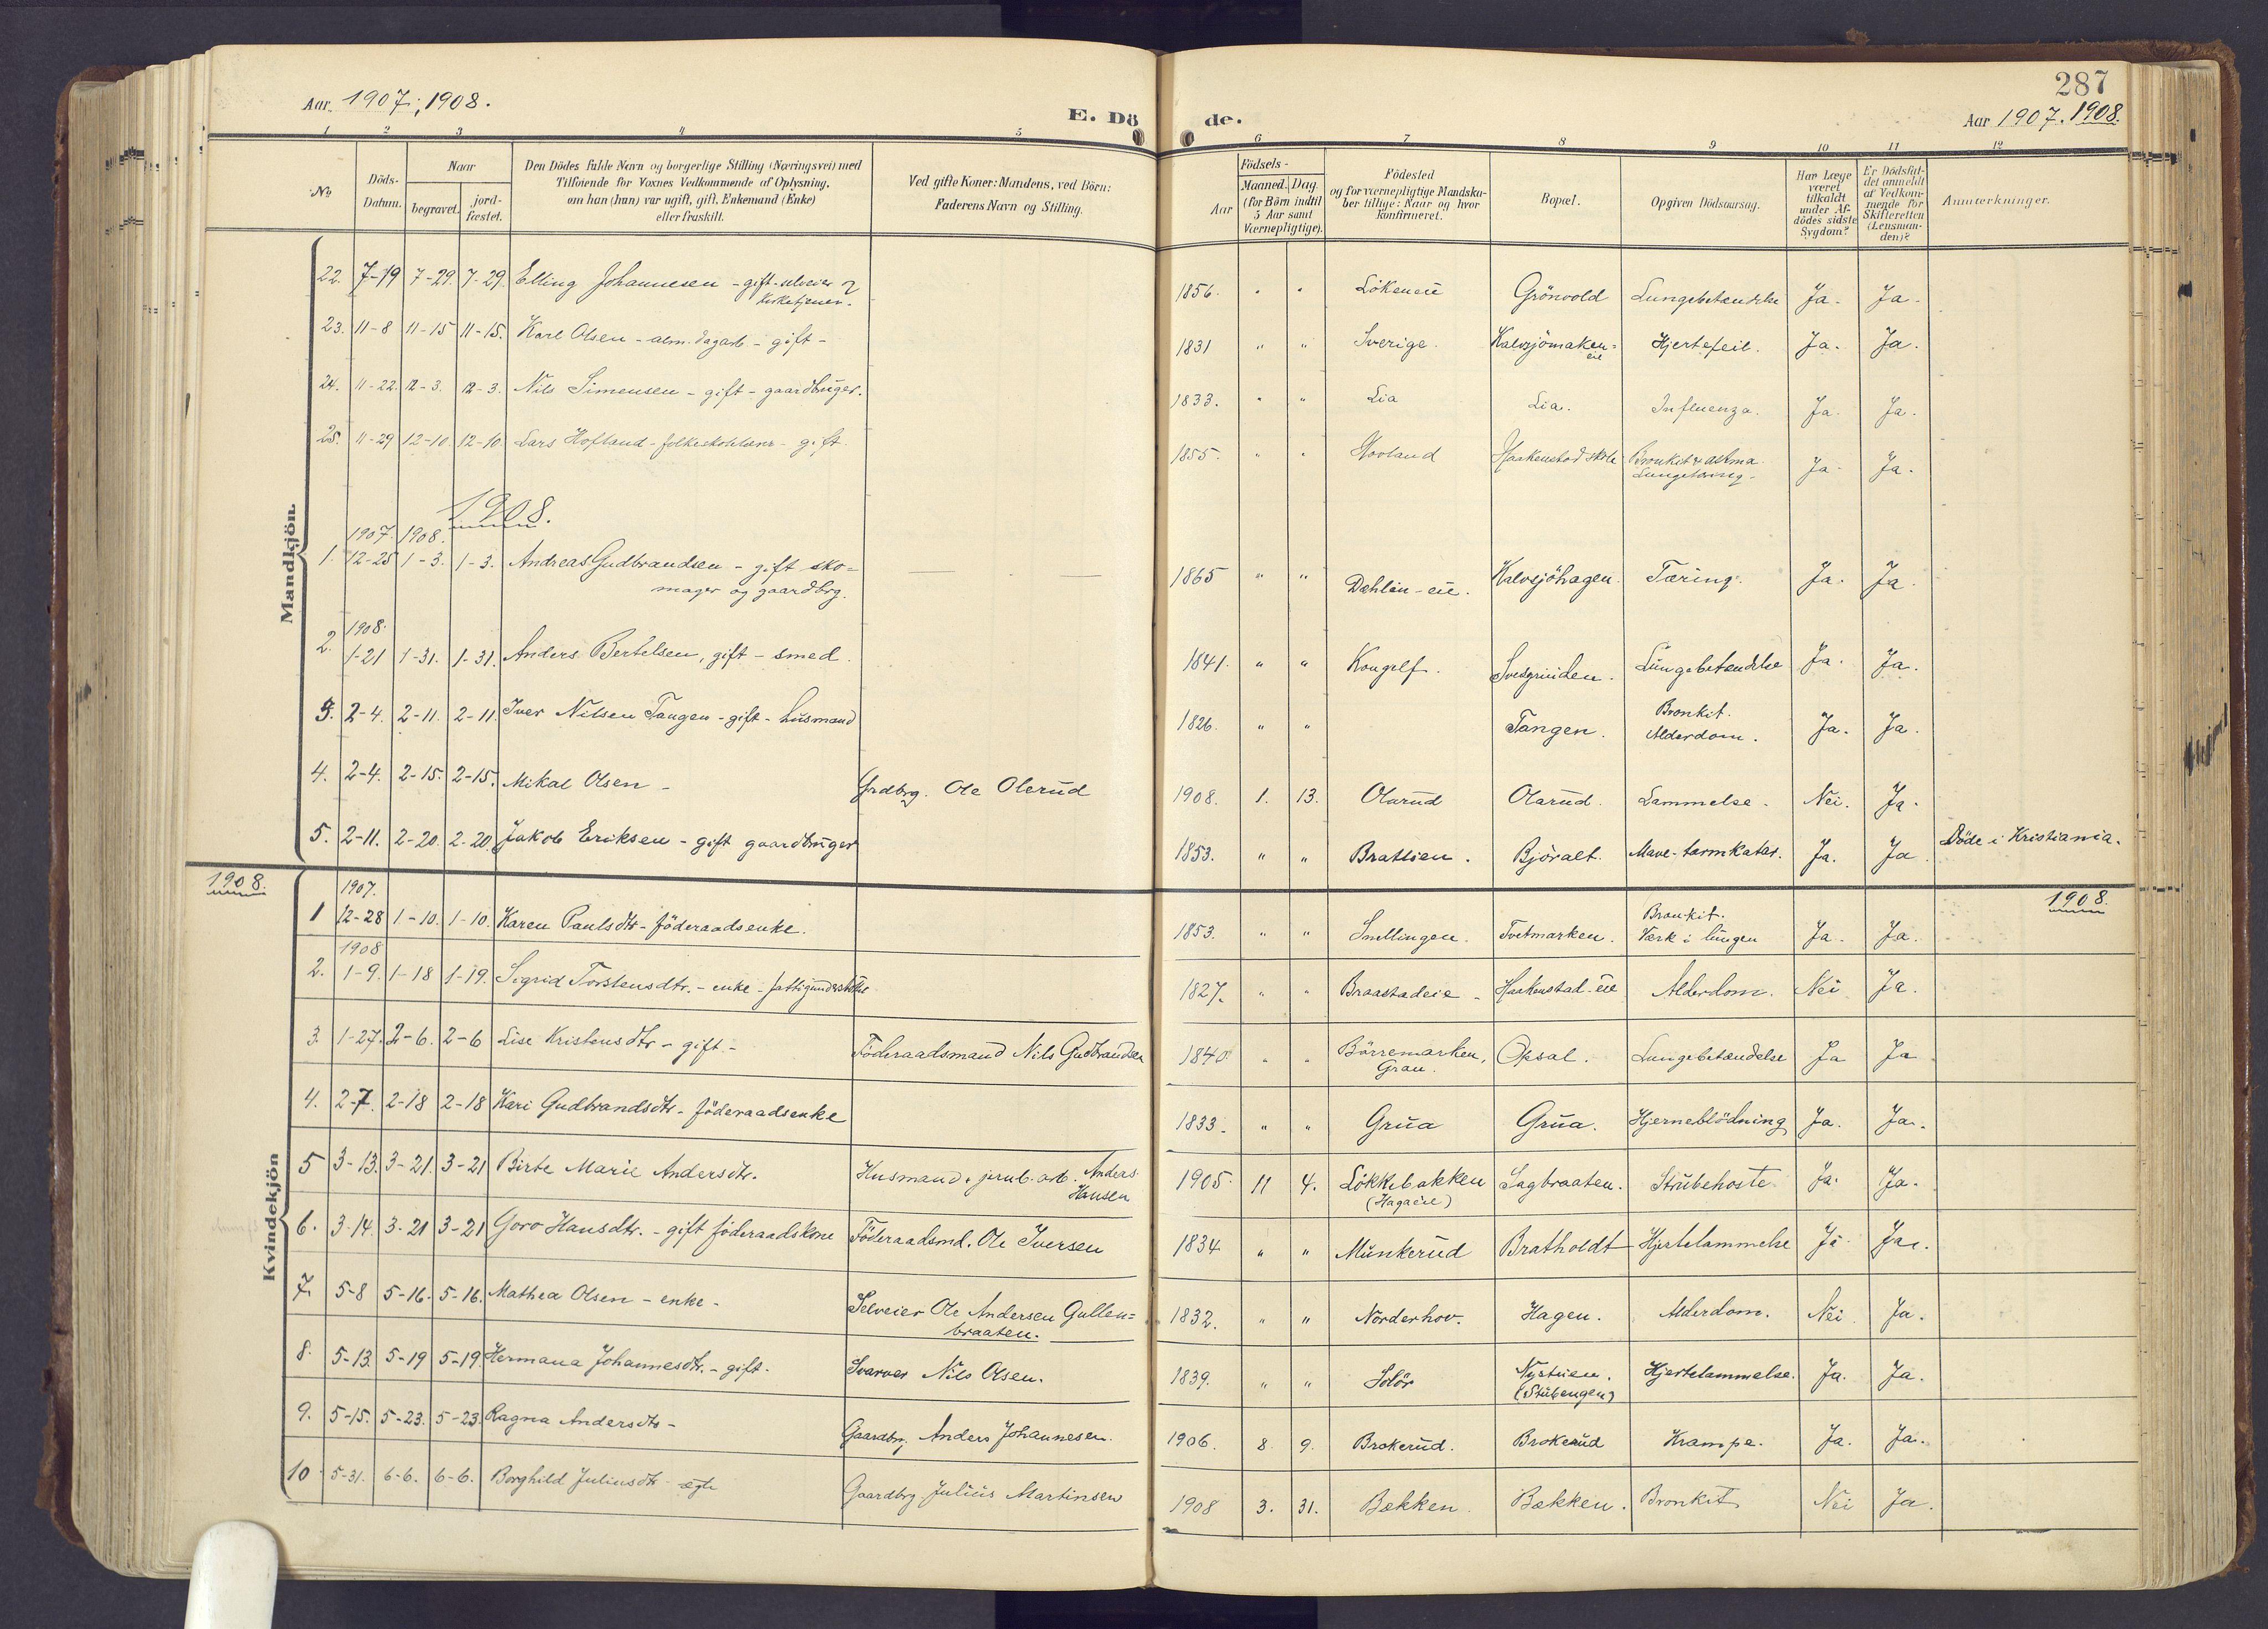 SAH, Lunner prestekontor, H/Ha/Haa/L0001: Ministerialbok nr. 1, 1907-1922, s. 287